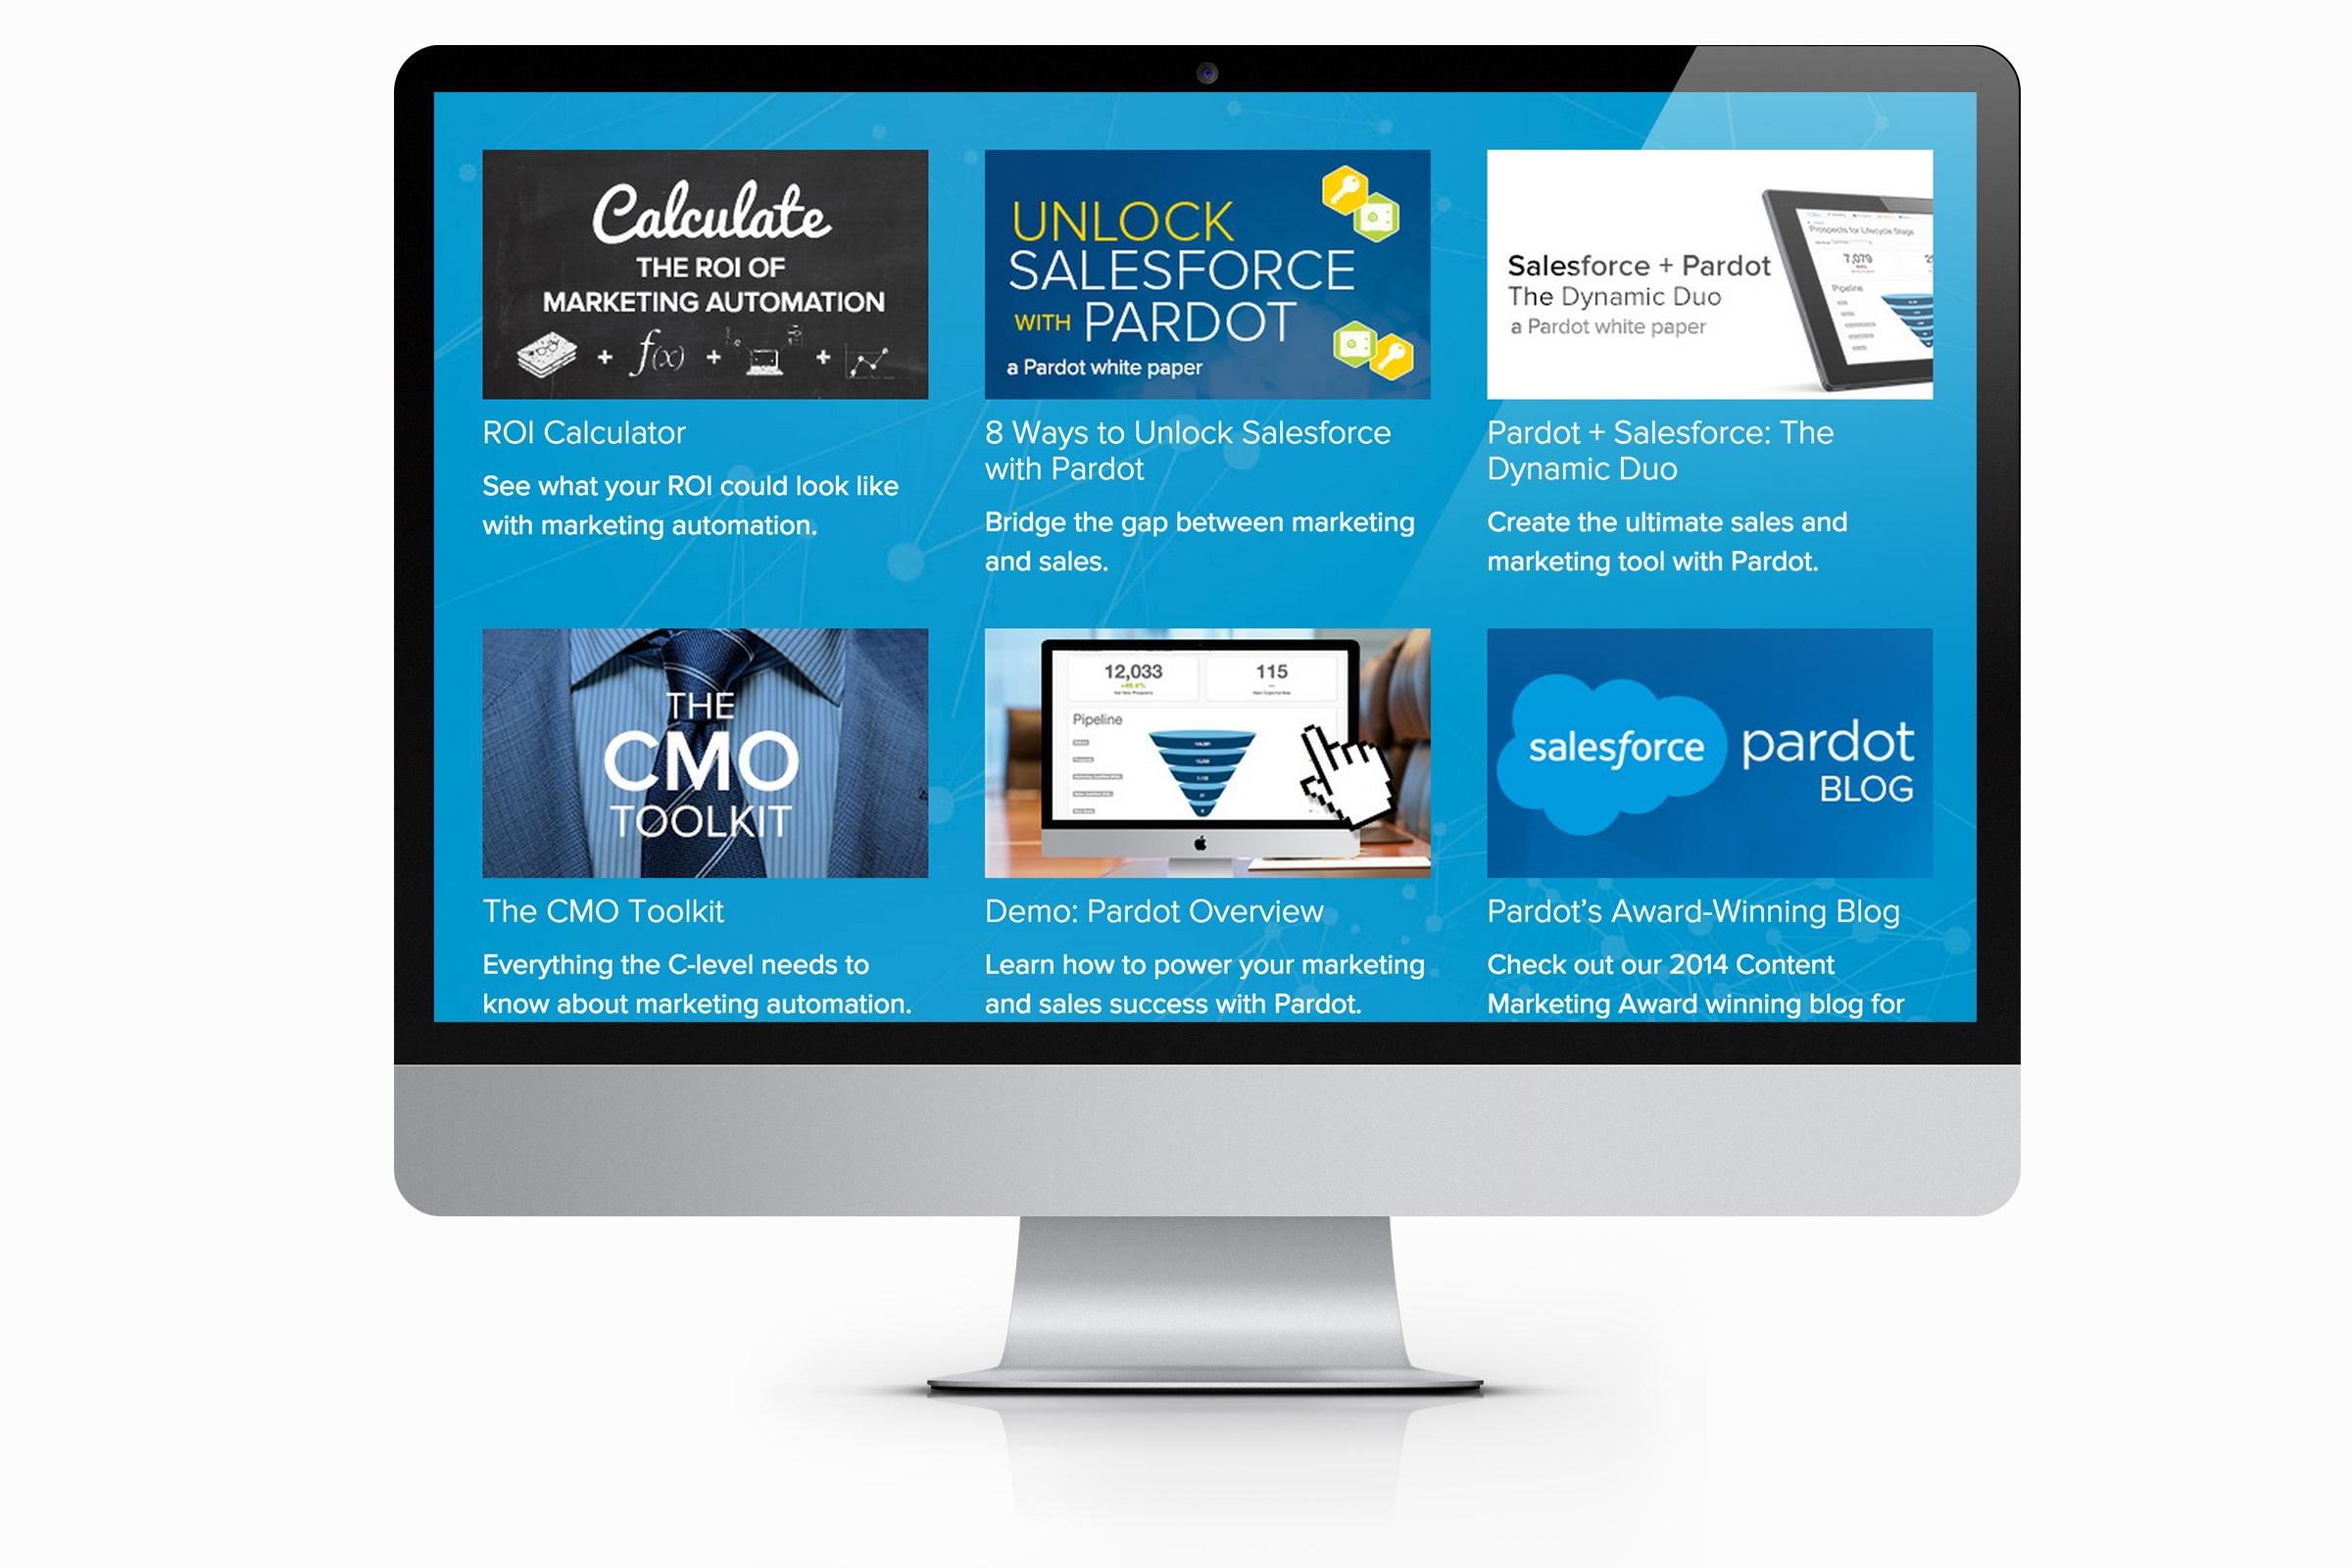 Pardot_Salesforce_Microsite_5_1200x800.jpg